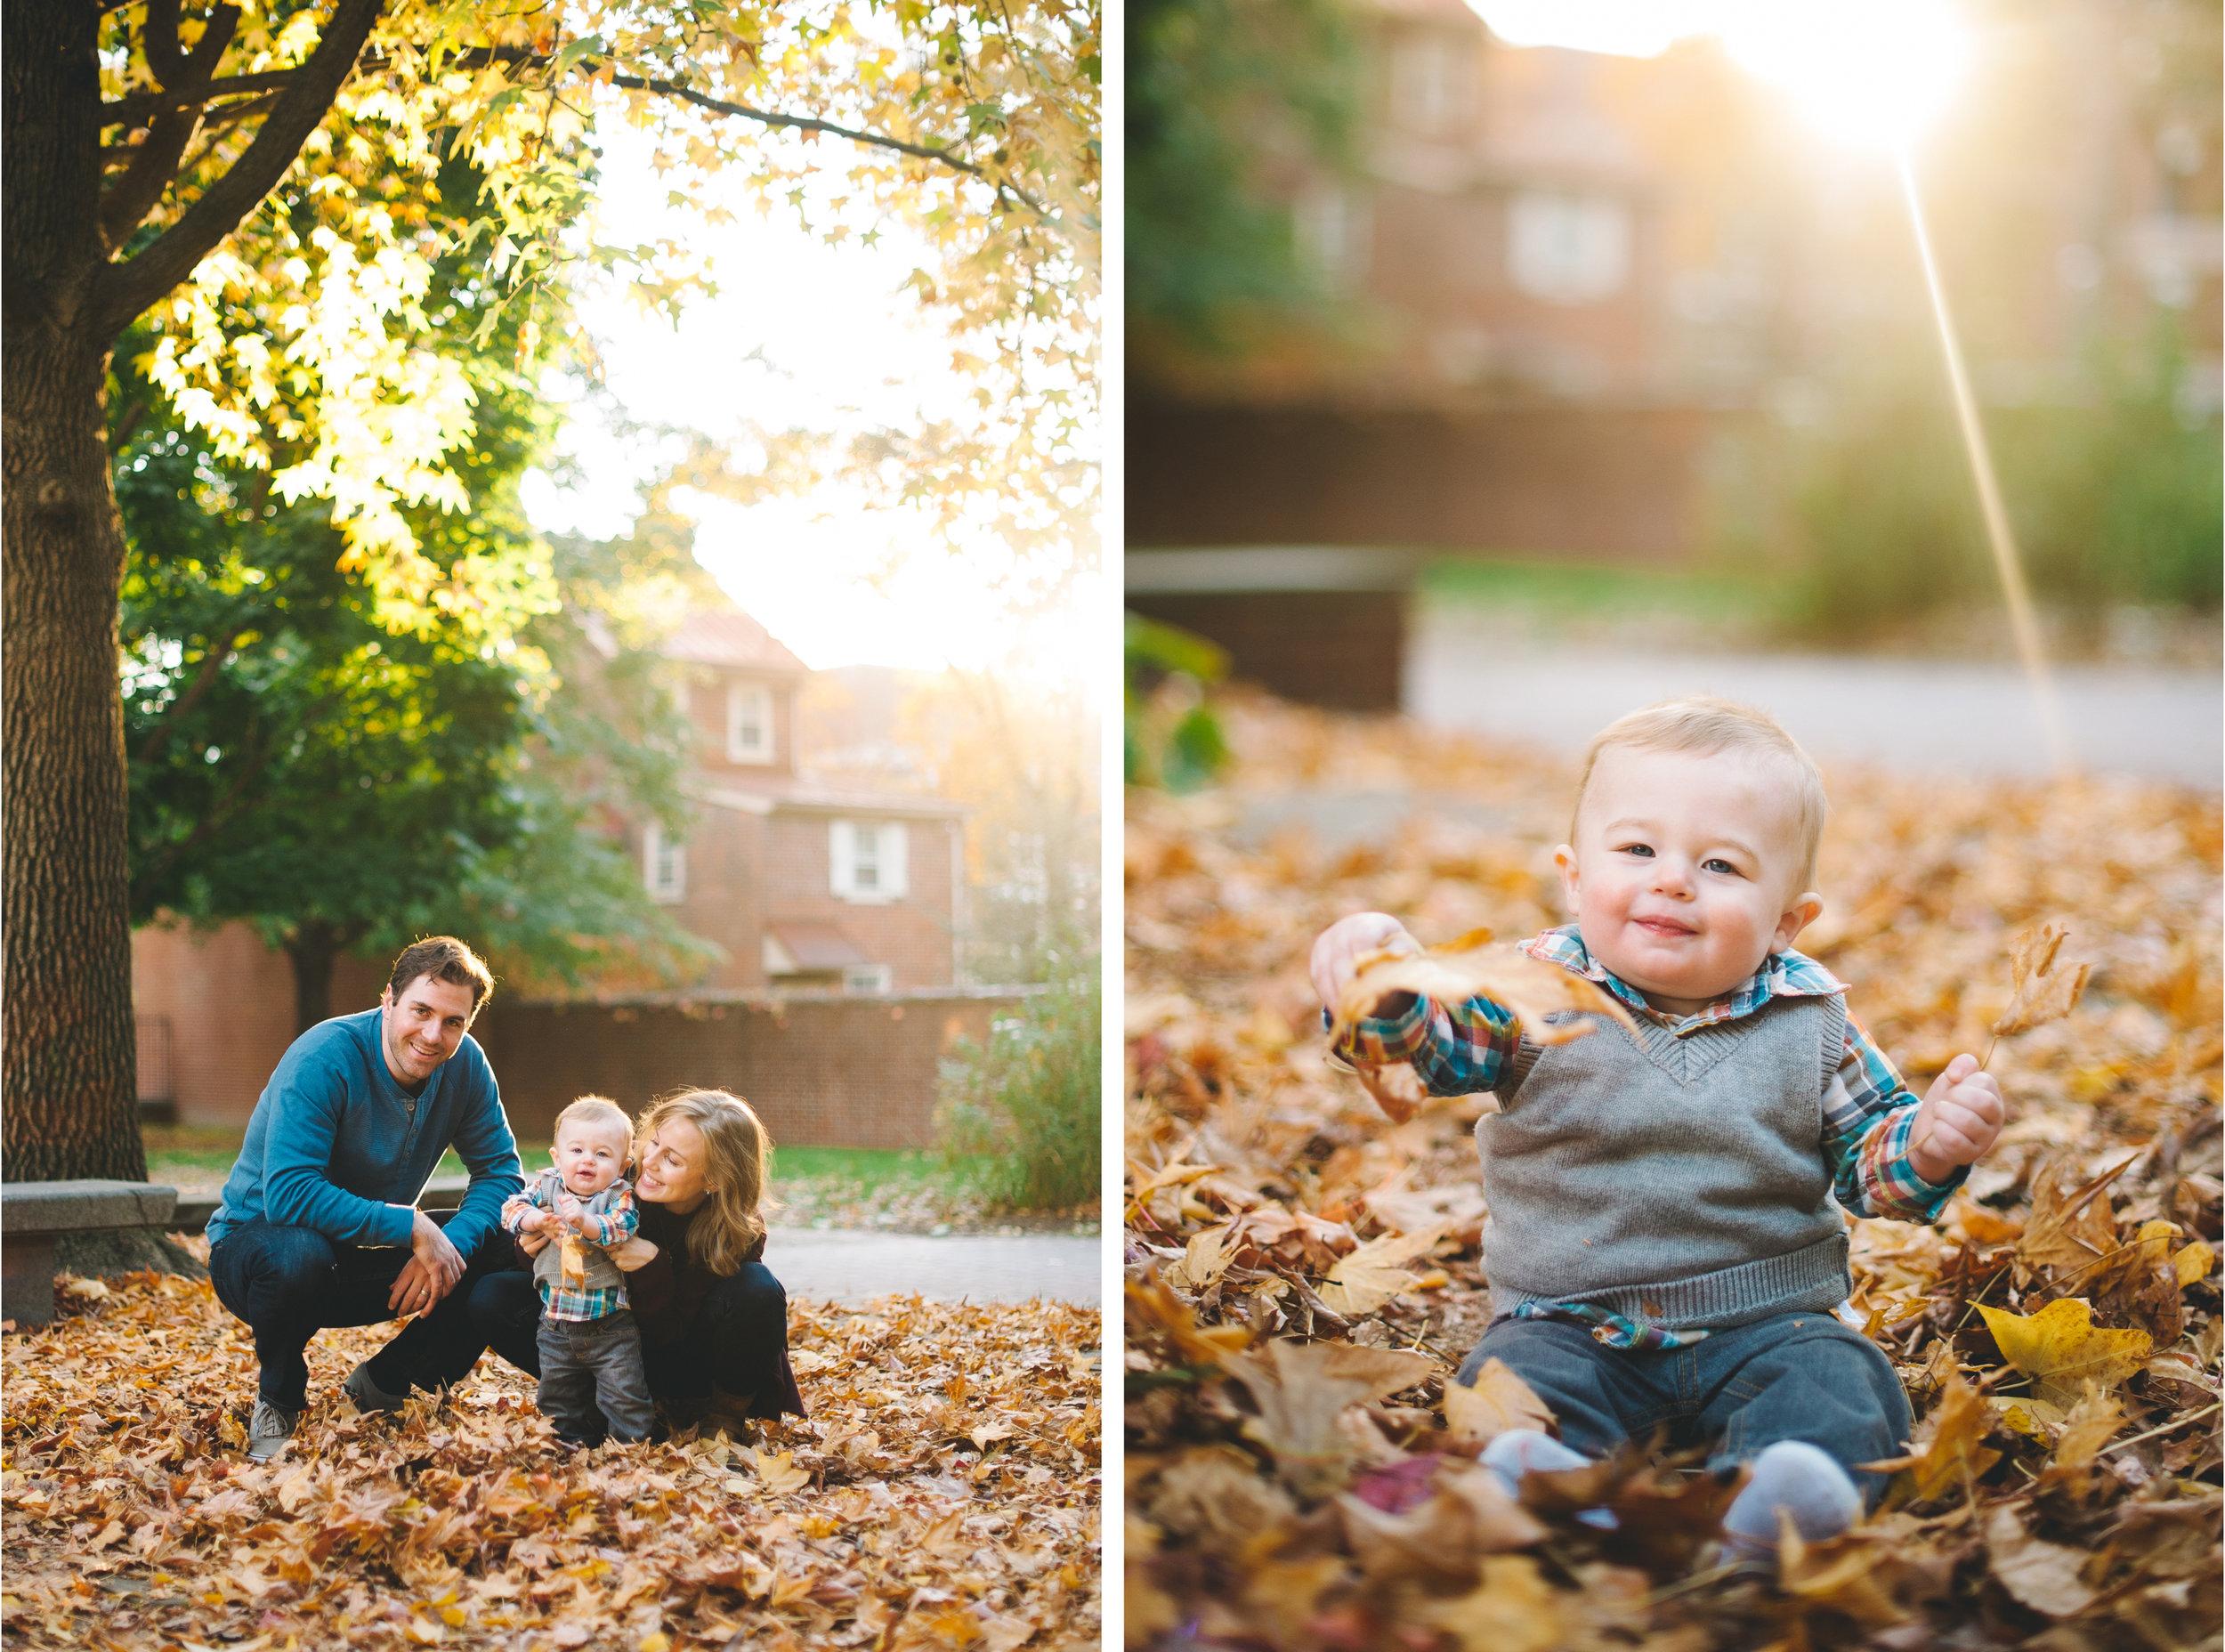 Peaberry-Photography-Philadlphia-Family-Portraits-025.jpg